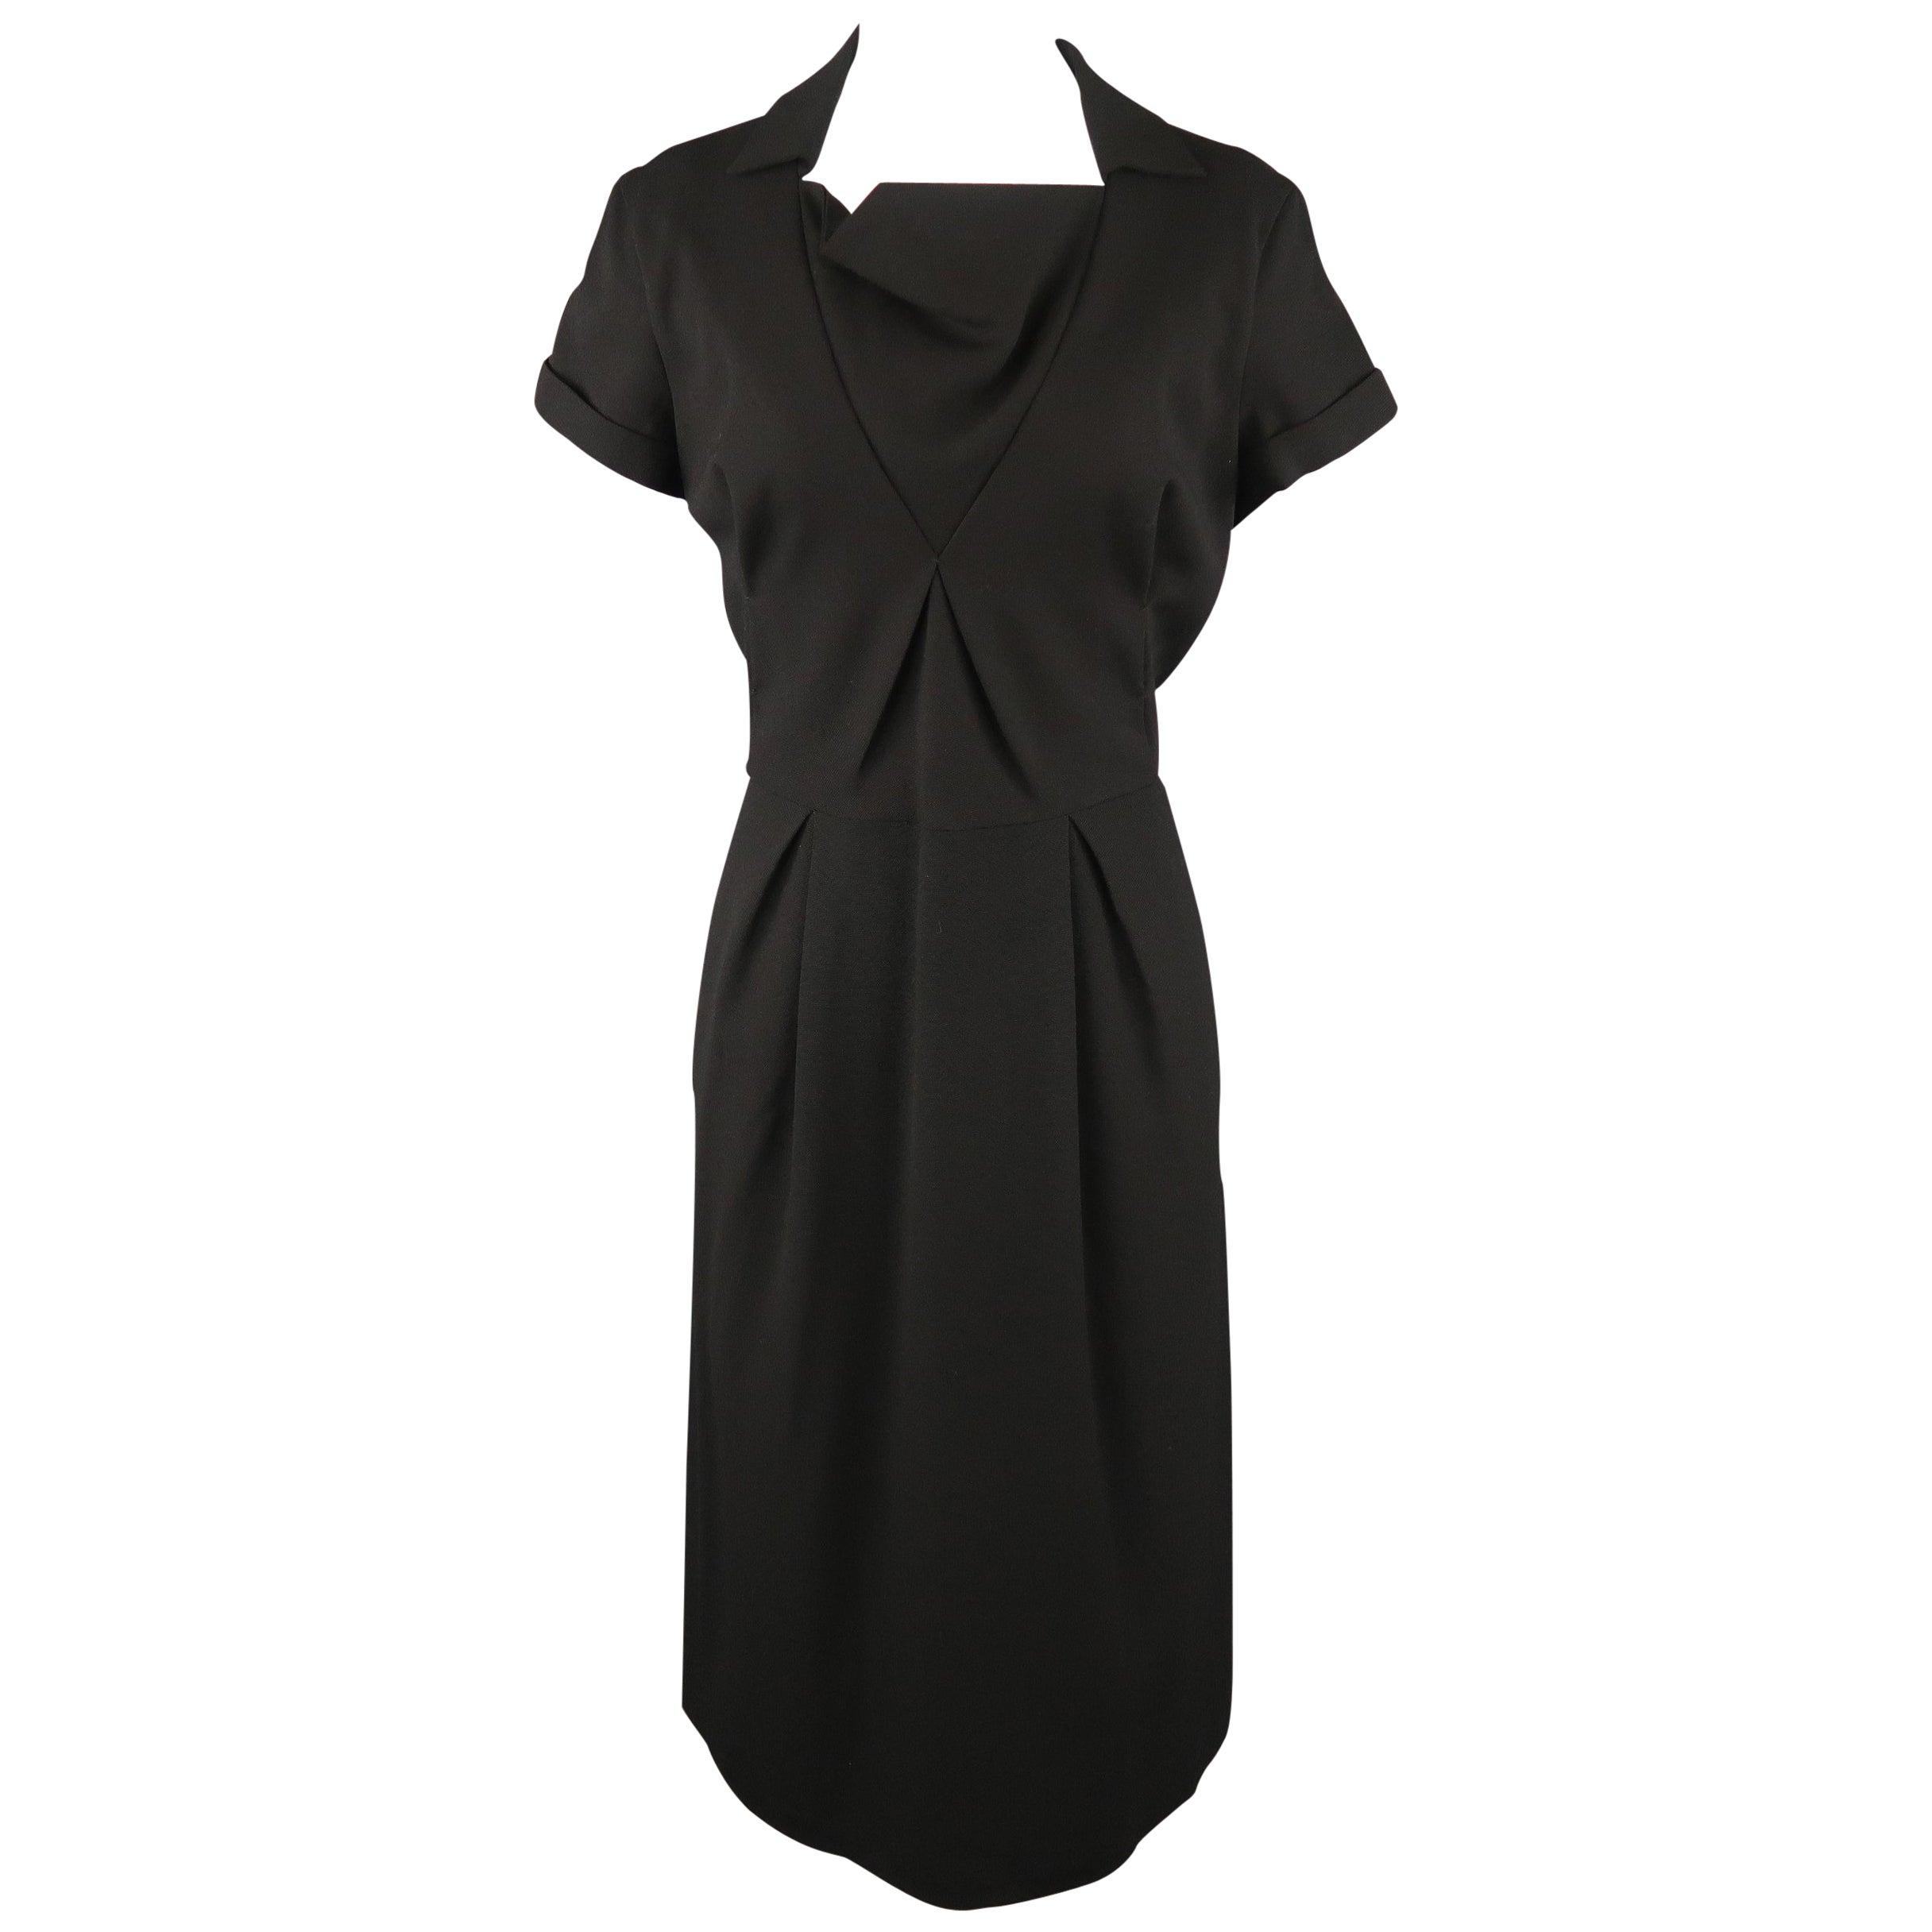 BOTTEGA VENETA Size 8 Black Virgin Wool Collared Oragami Shift Dress